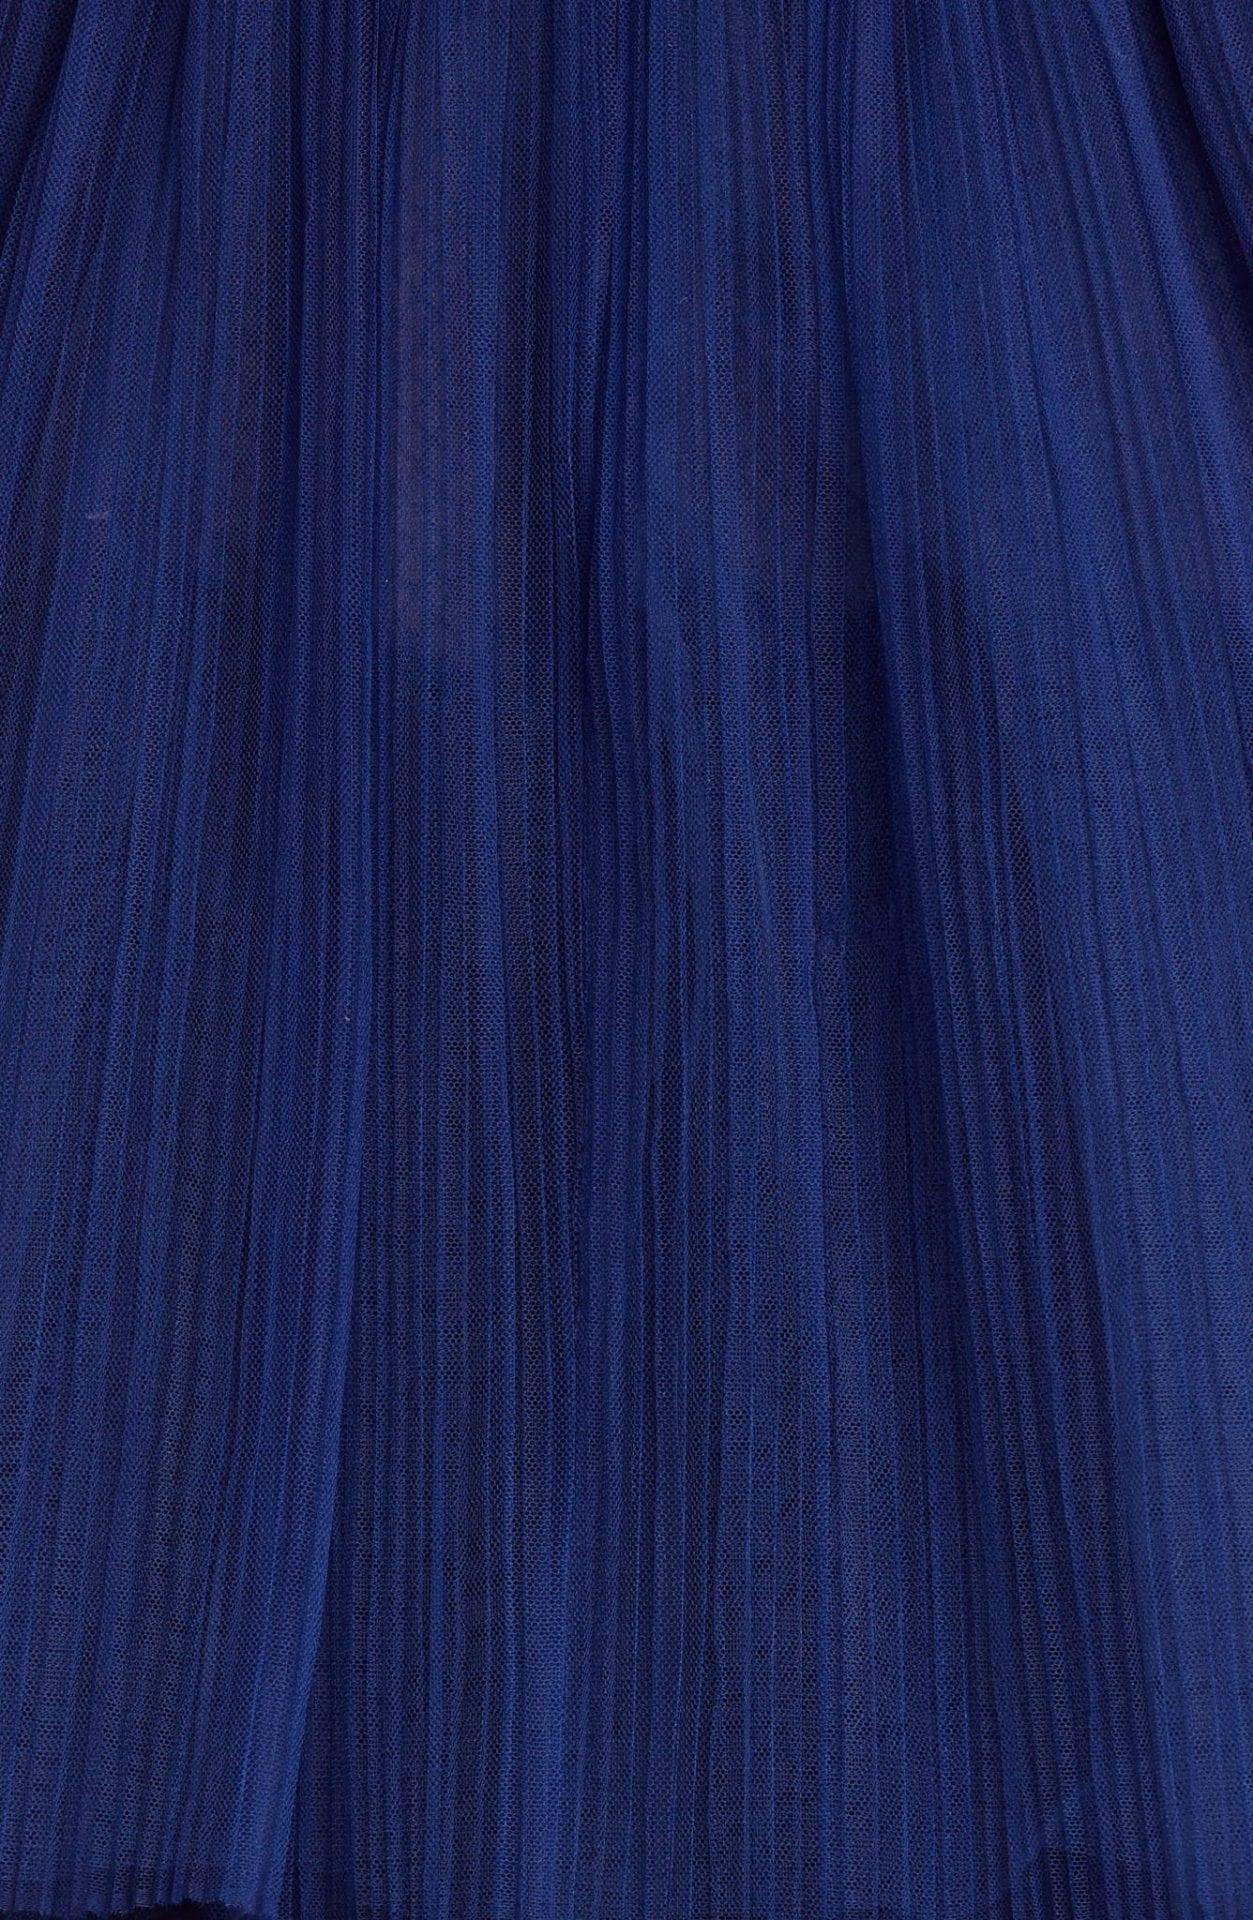 PAMELLA ROLAND Strapless Beaded Tulle Midi Navy Dress